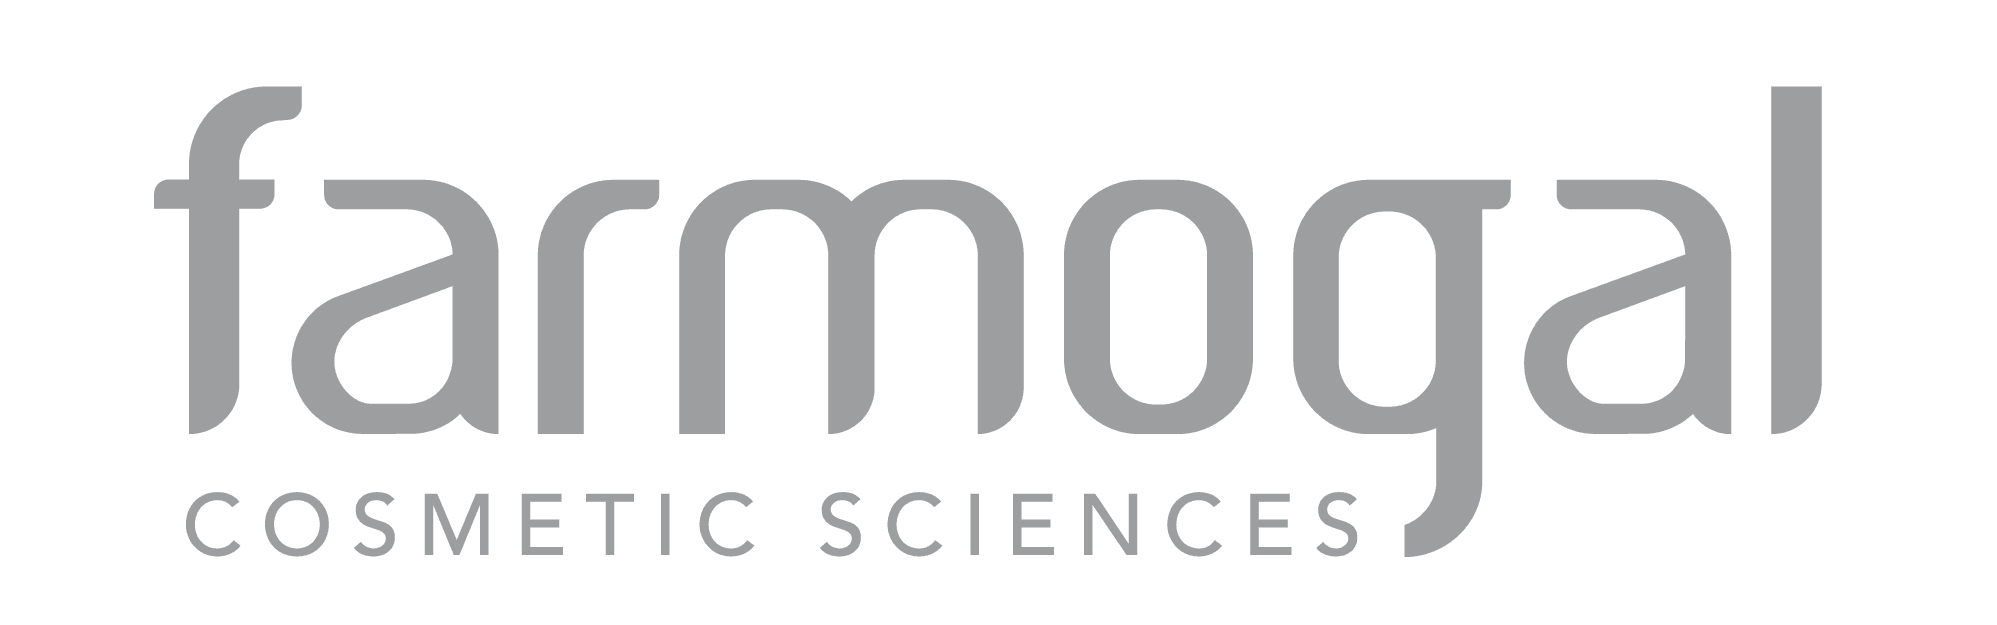 farmogal cosmetic sciences - logo